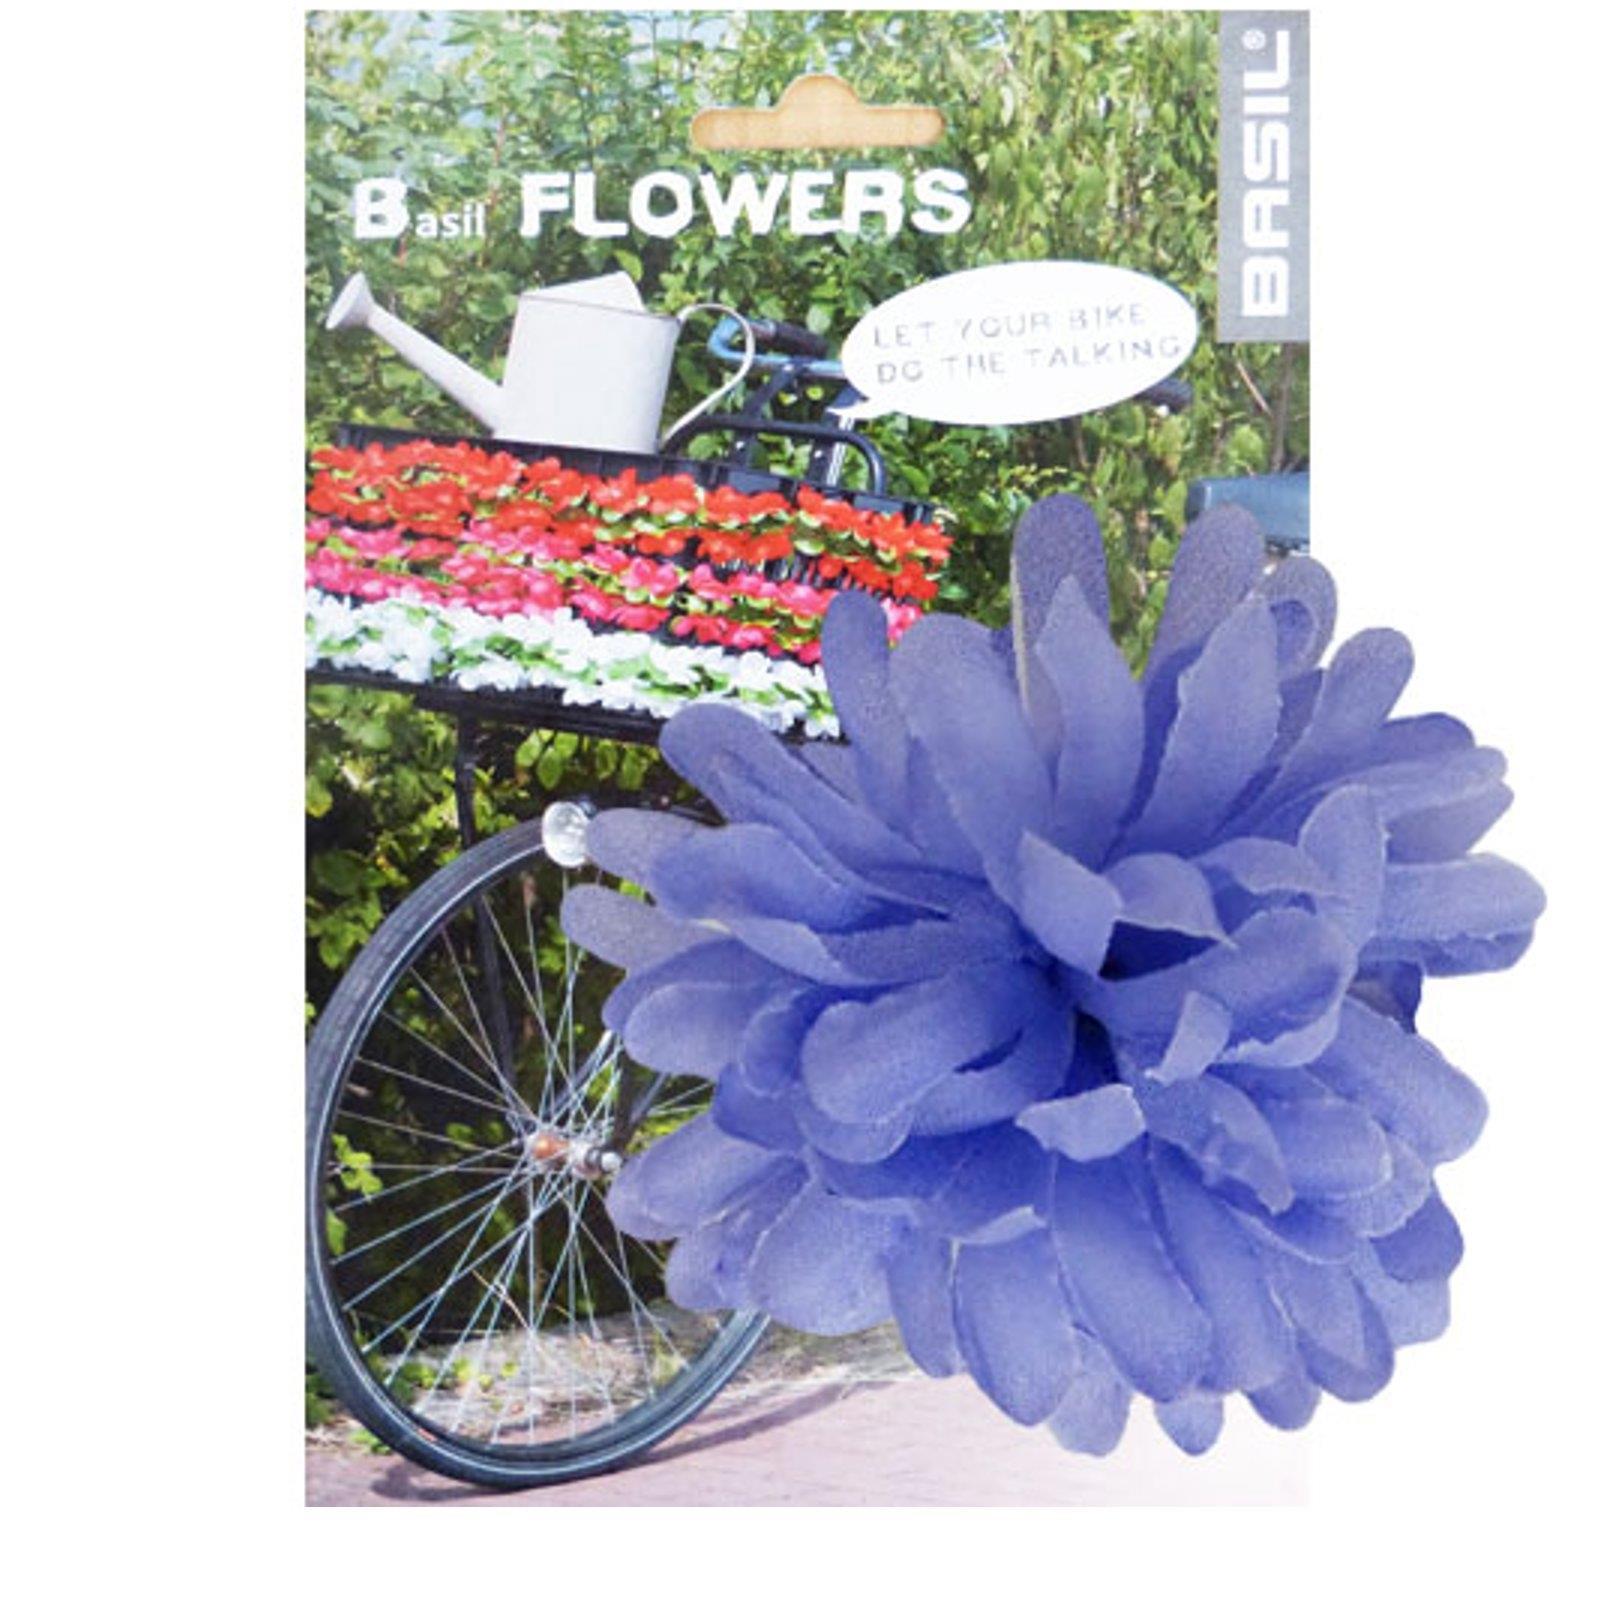 Basil flower dahlia fahrrad lenkerblume dekoration dekor blume fahrradlenker ebay - Dekoration fahrrad ...